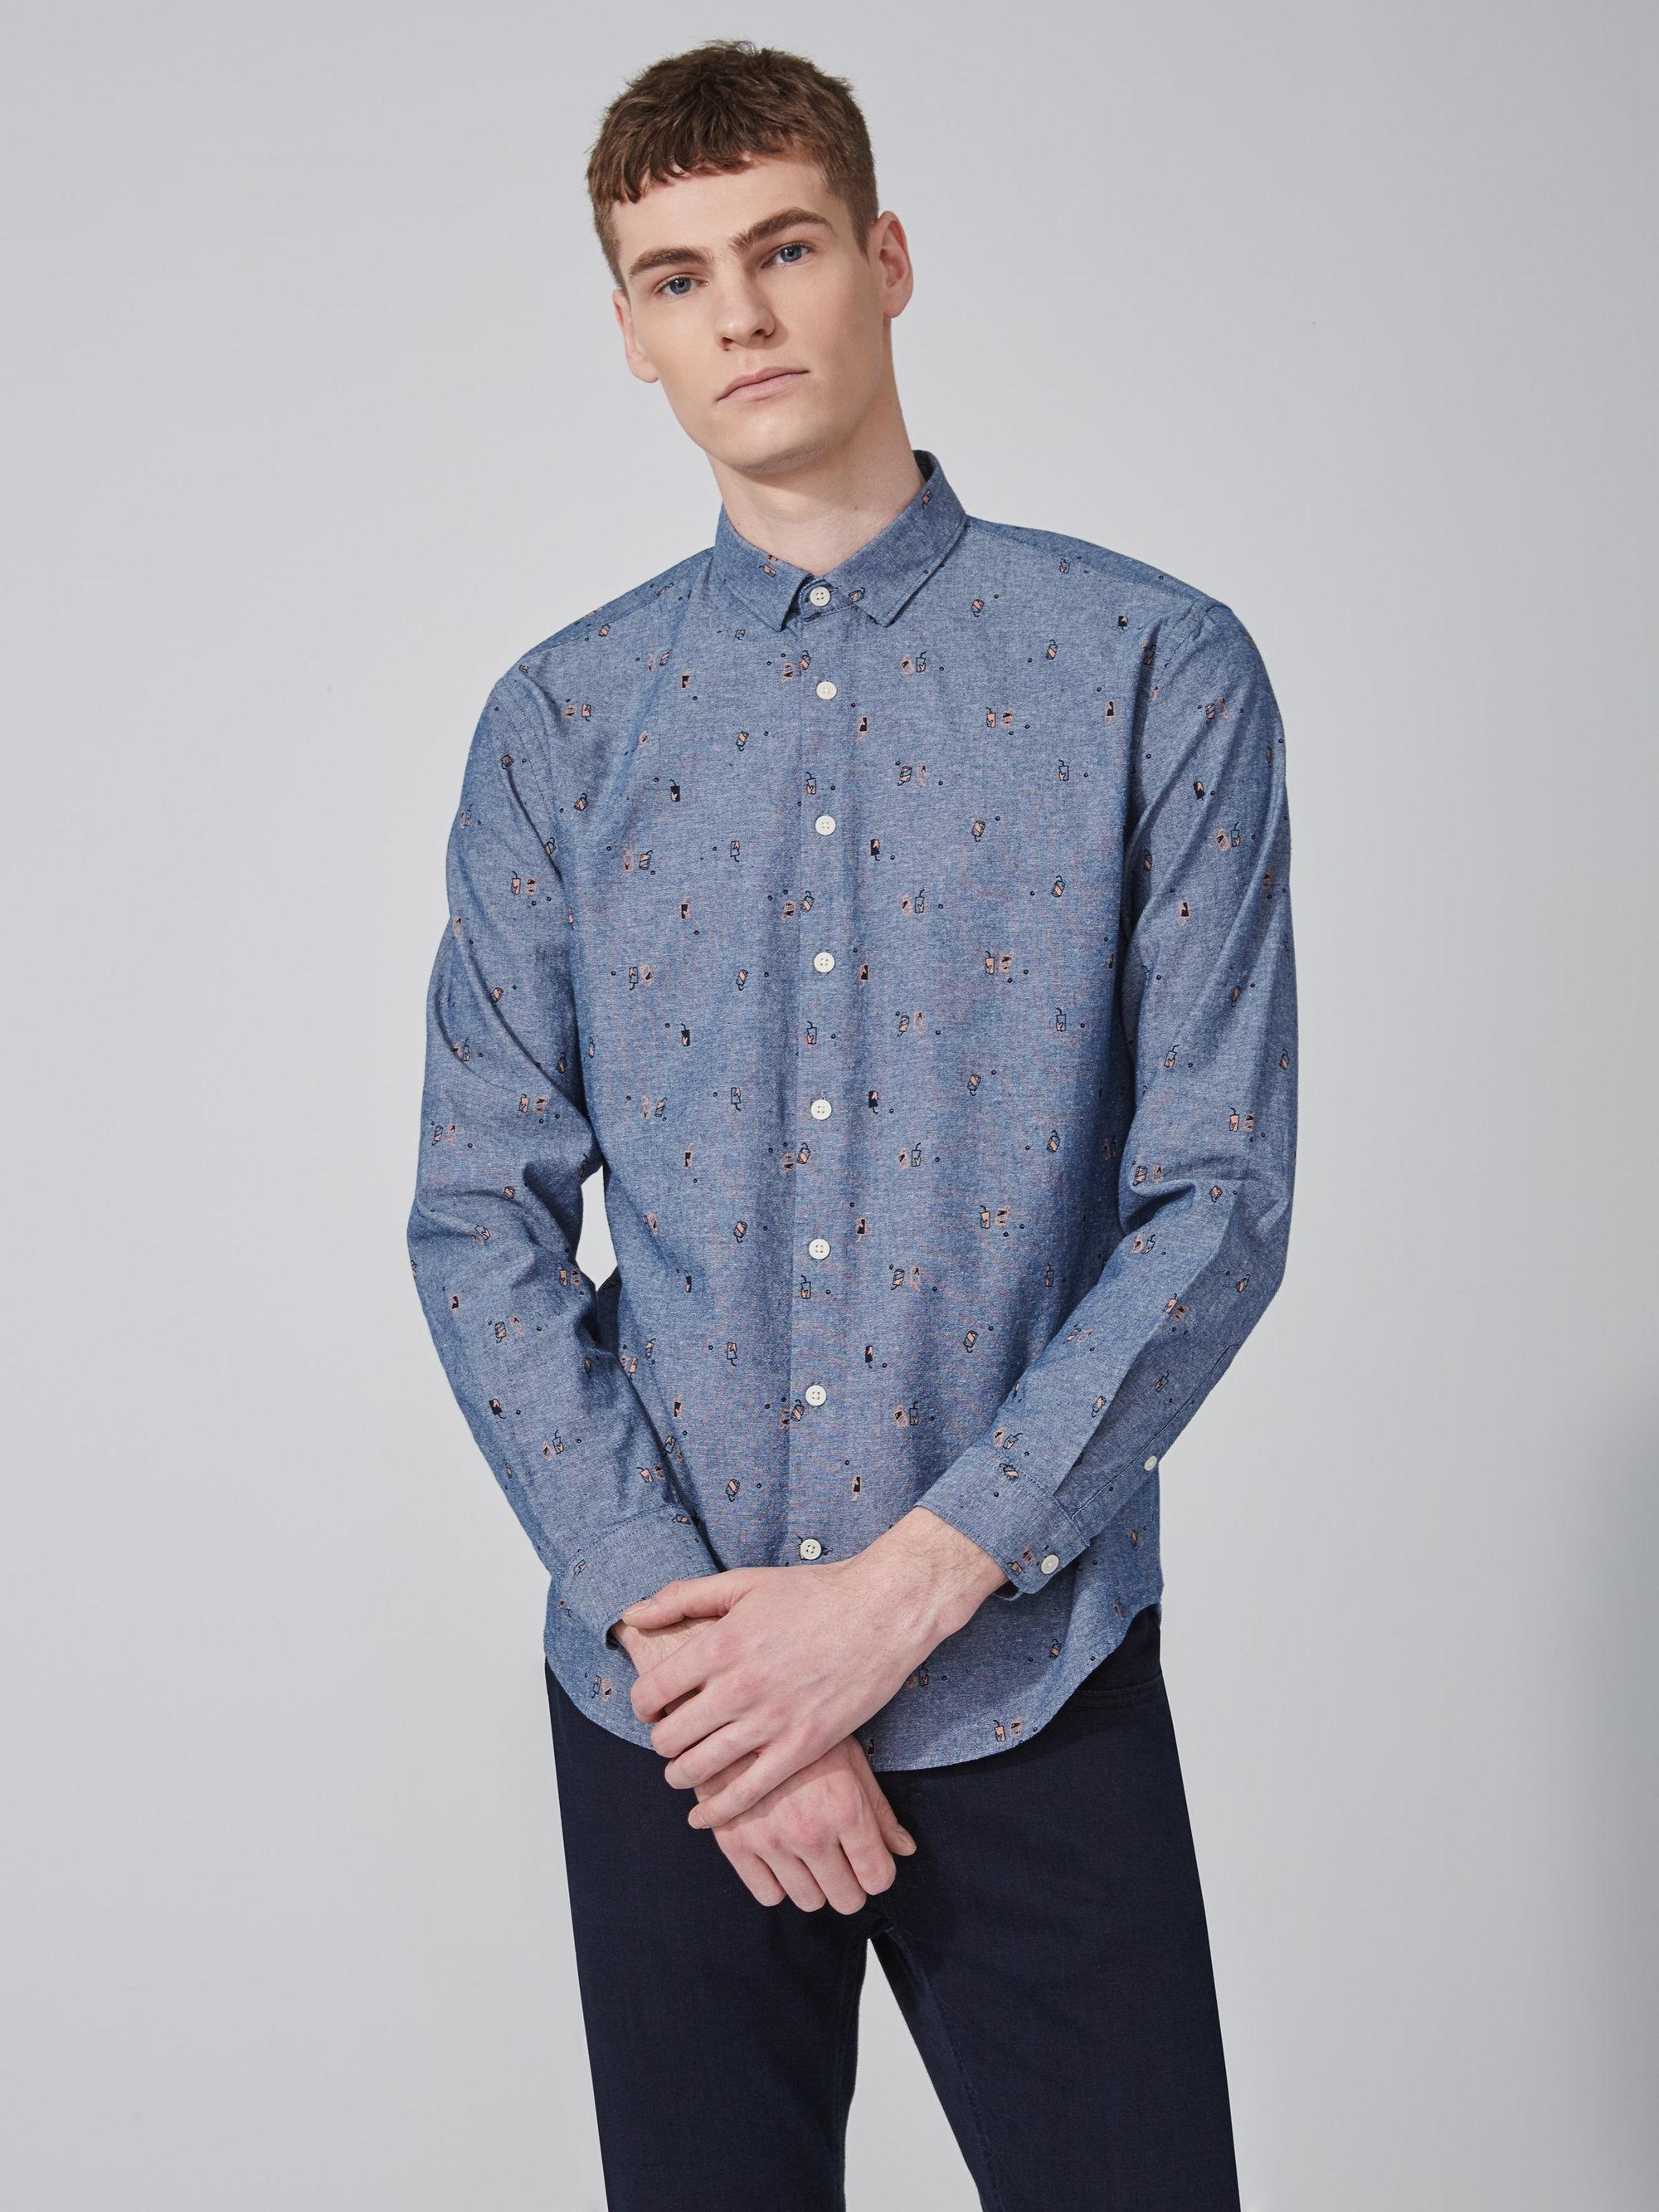 frank oak soda print chambray cotton shirt in blue in